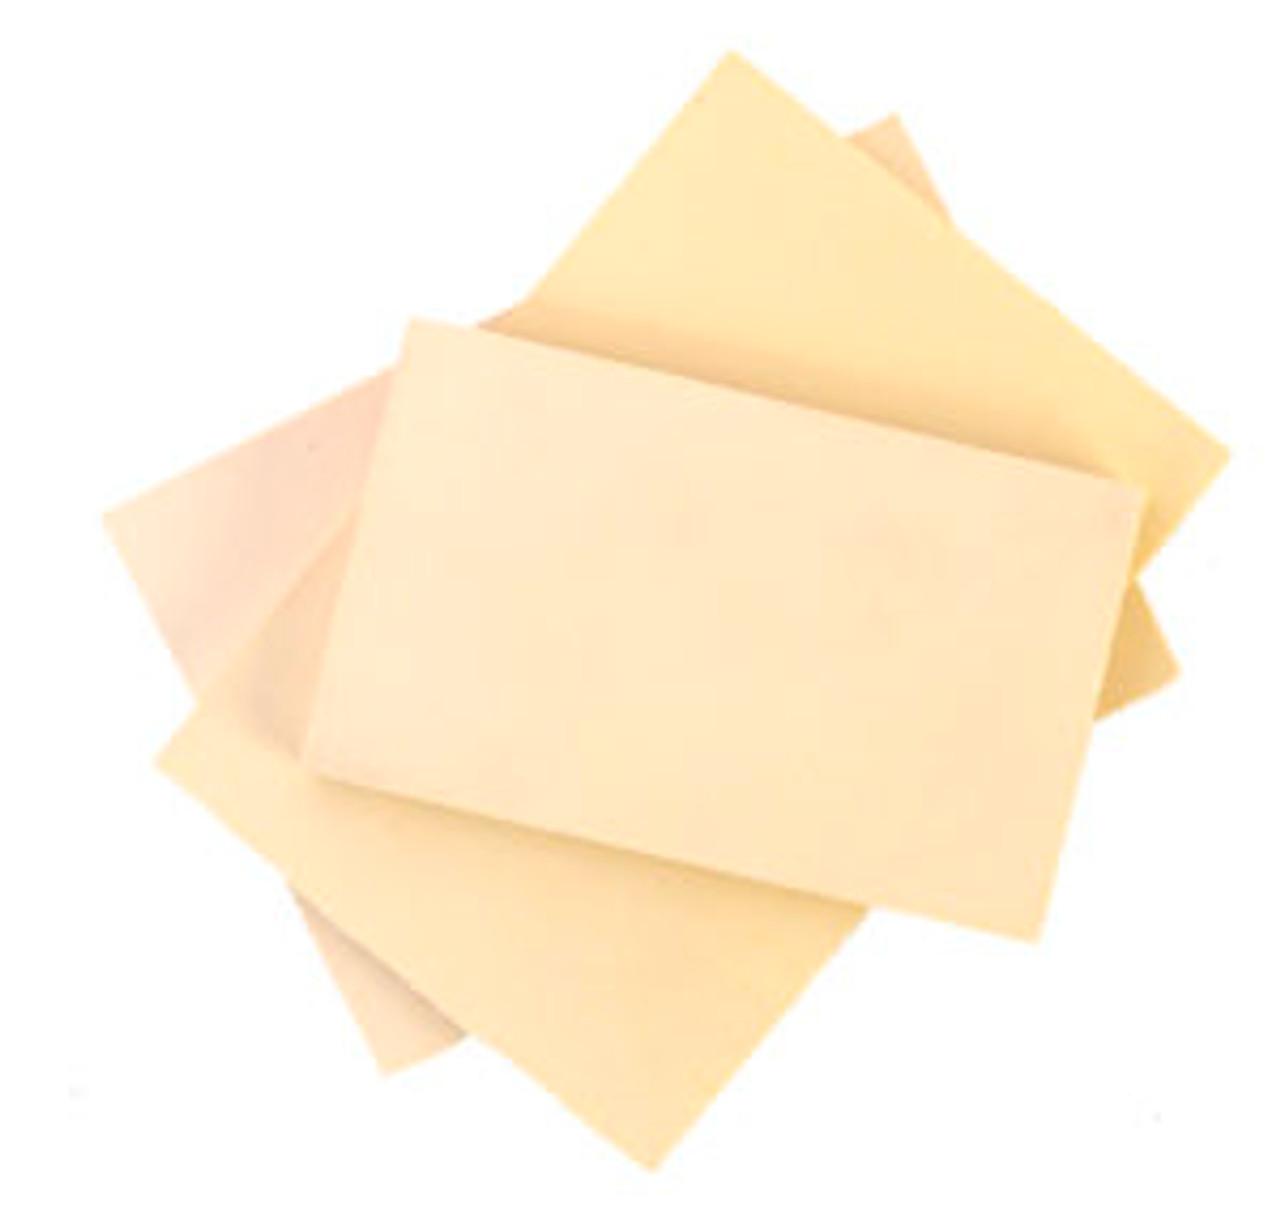 Speedy-Cut Blocks